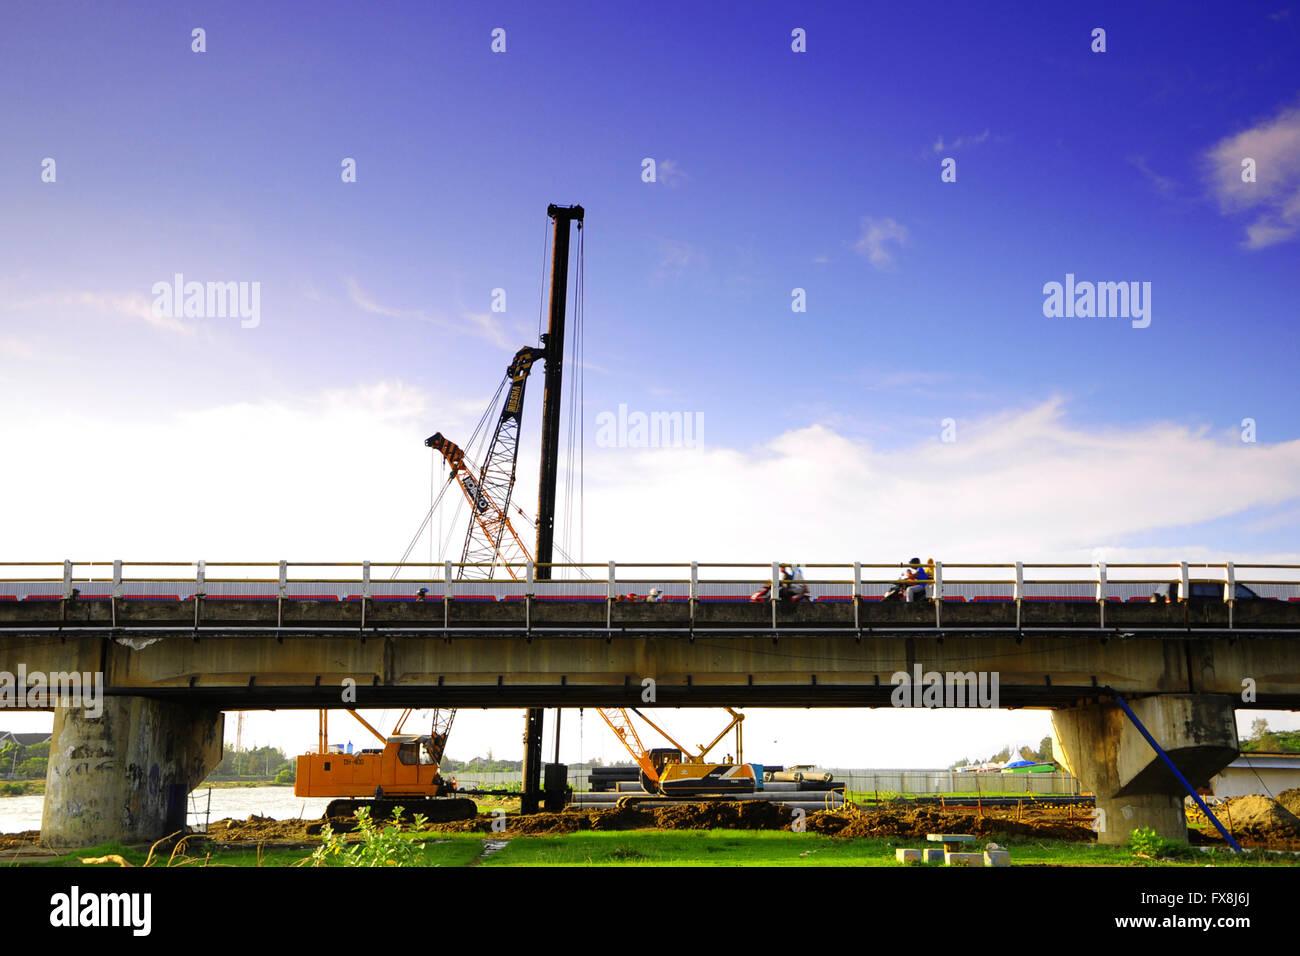 lamnyong bridge project in Banda Aceh, Indonesia Stock Photo